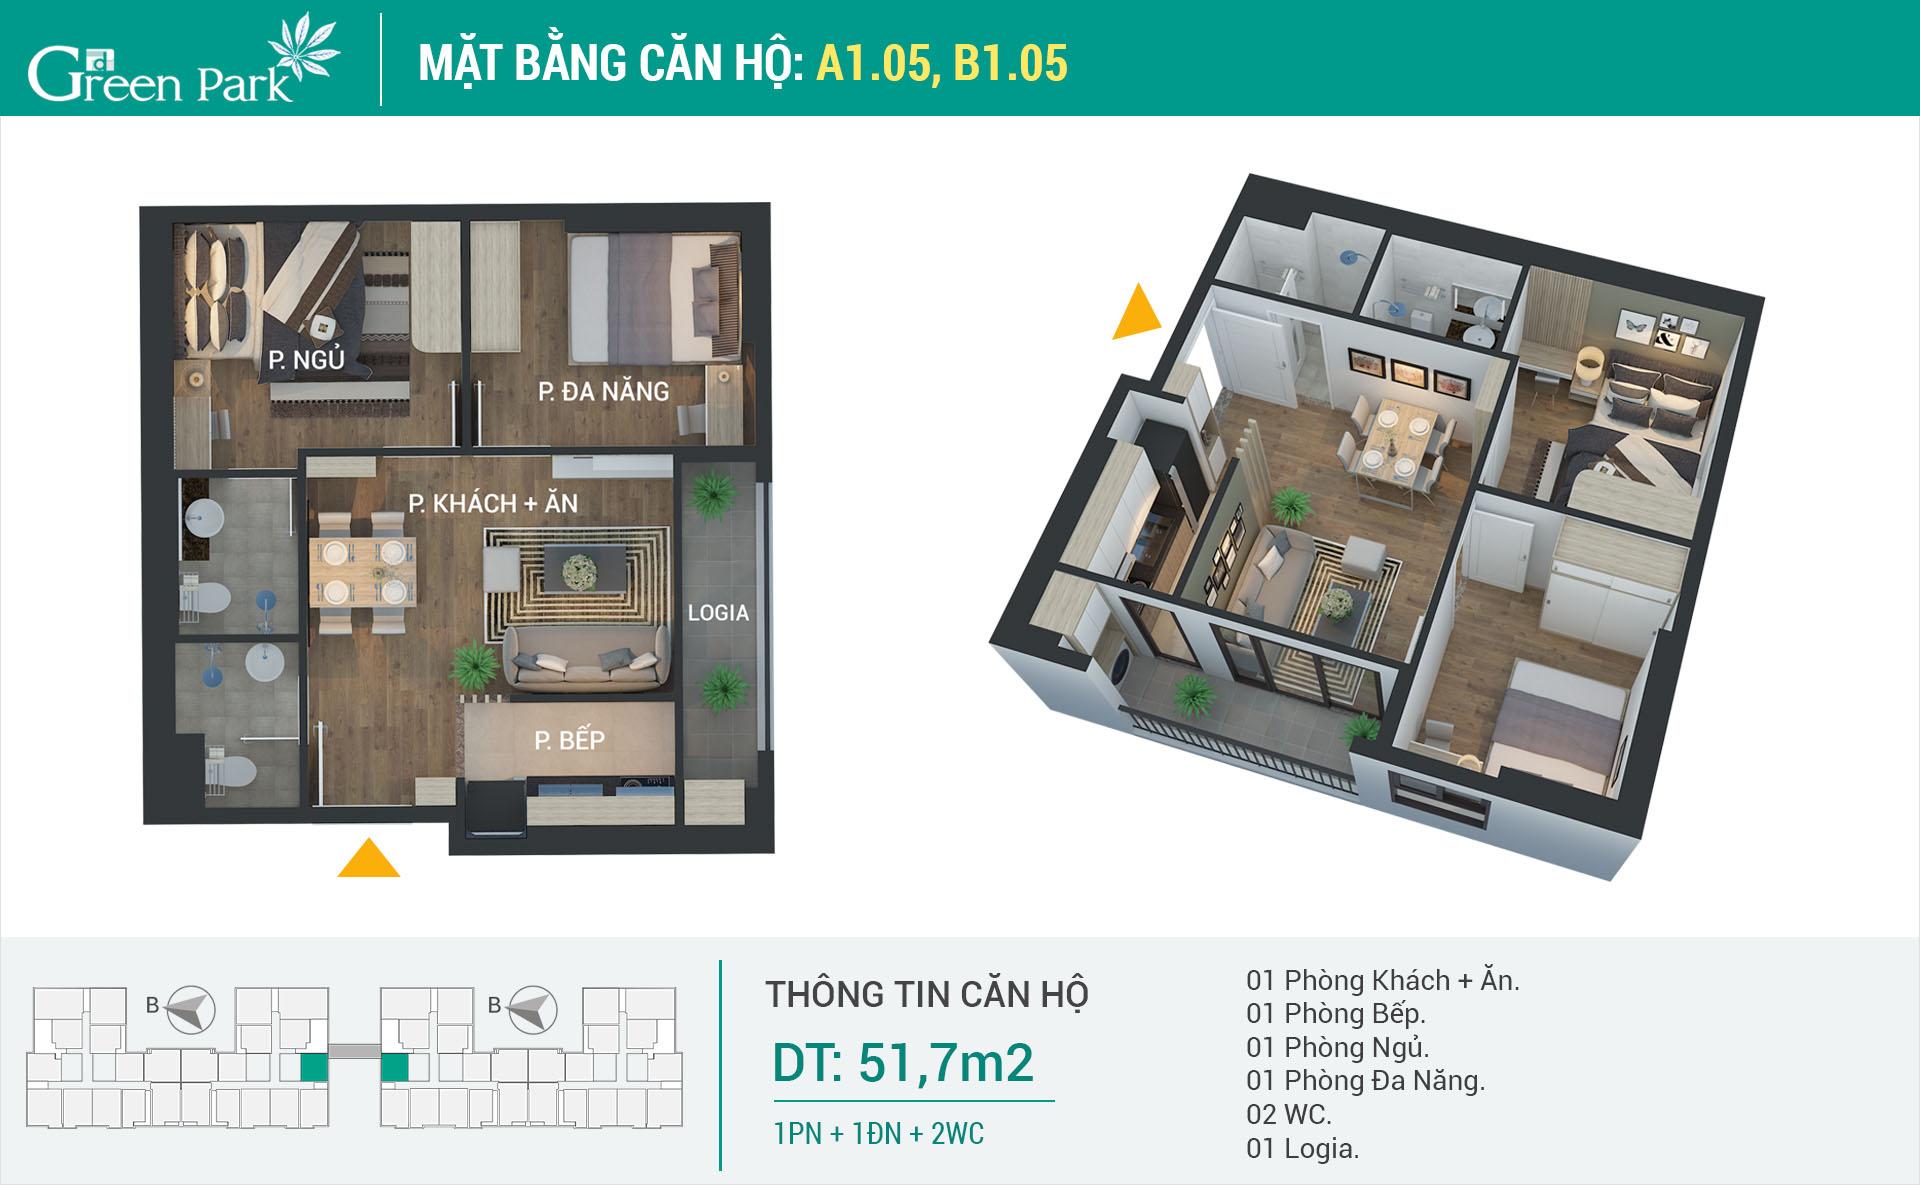 Mặt bằng căn hộ A1-05, B1-05